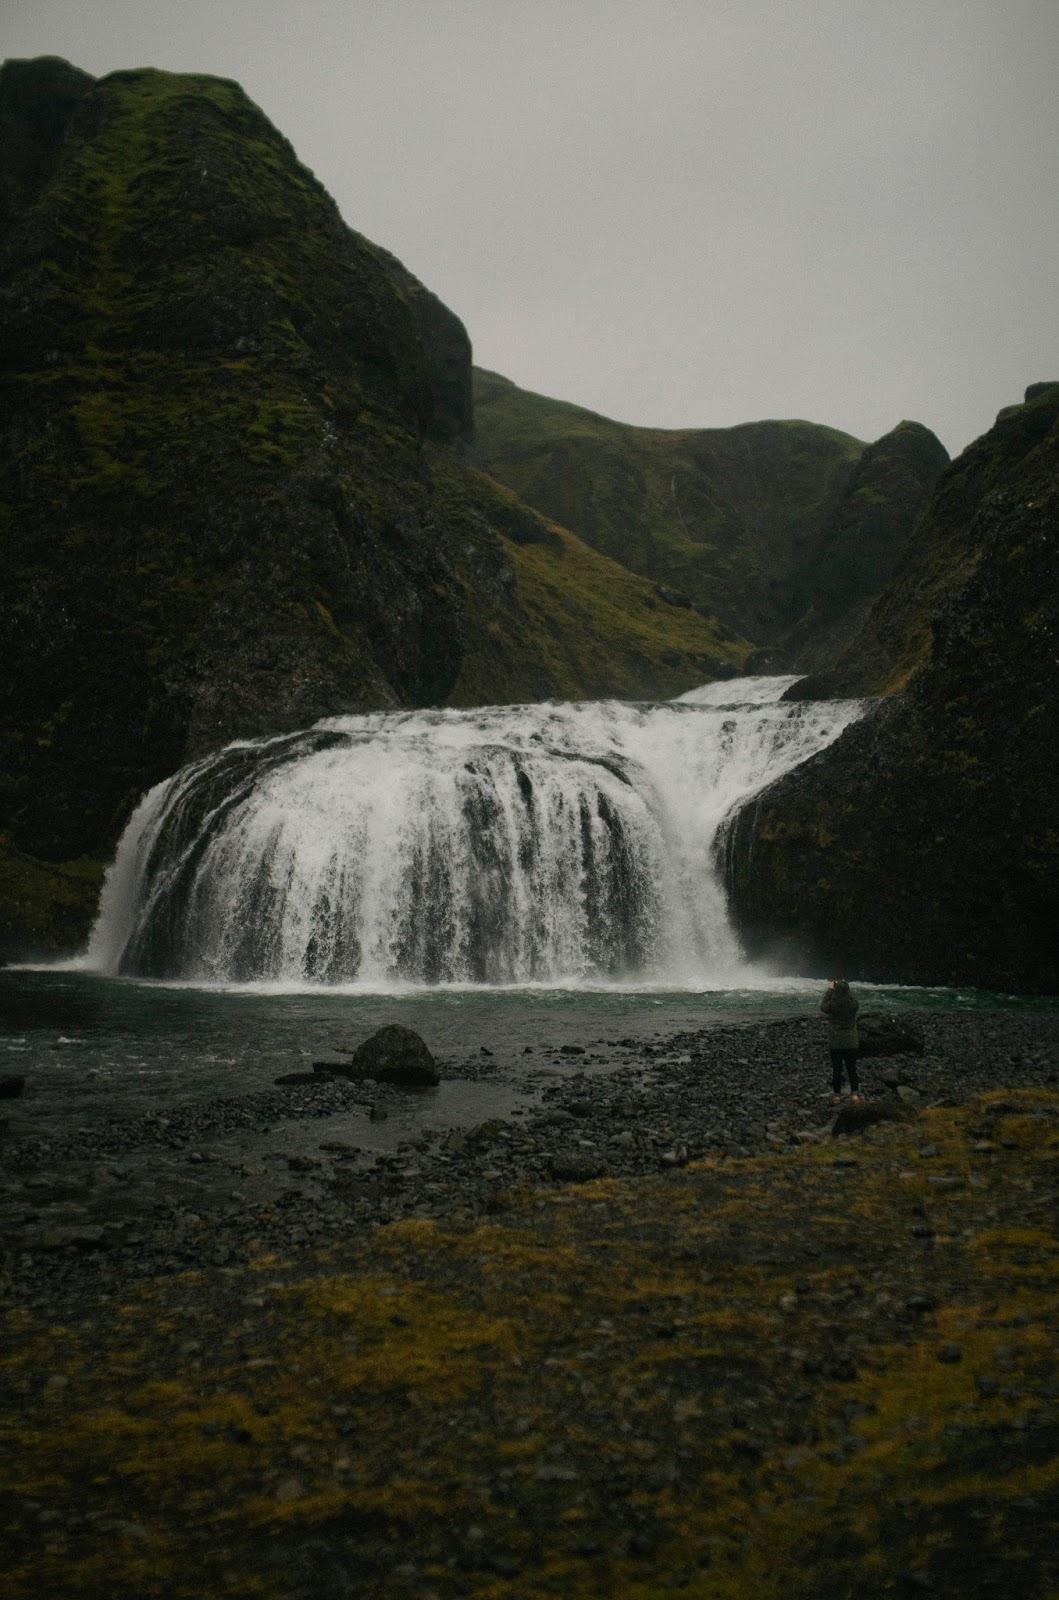 Stjornafoss, Kirkjubæjarklaustur, Iceland, South